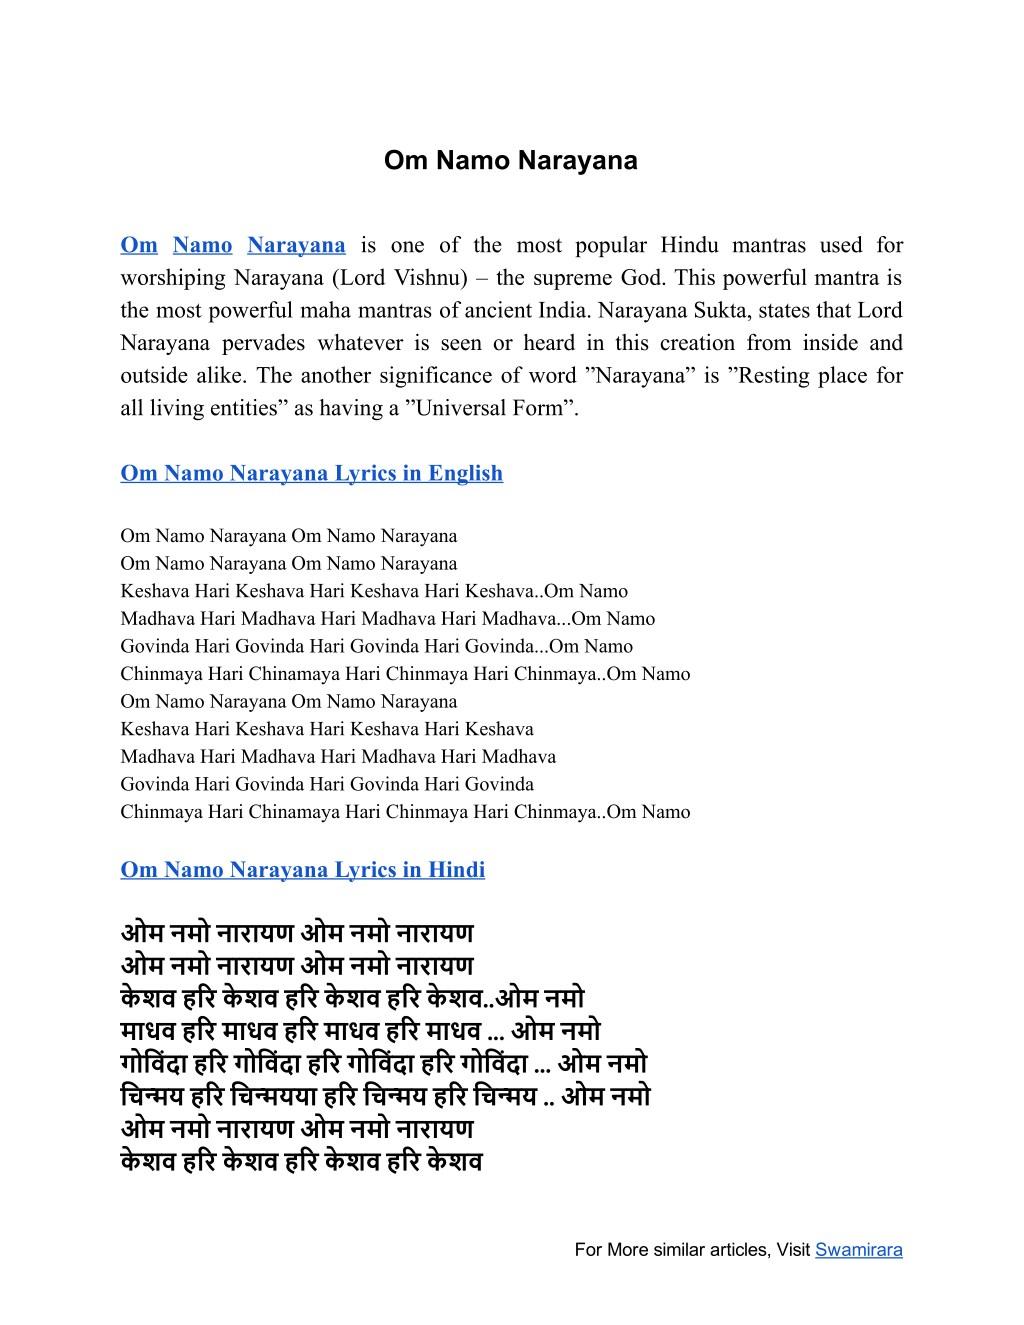 Powerpoint Ppt Presentat Om Namo Narayana – Meta Morphoz